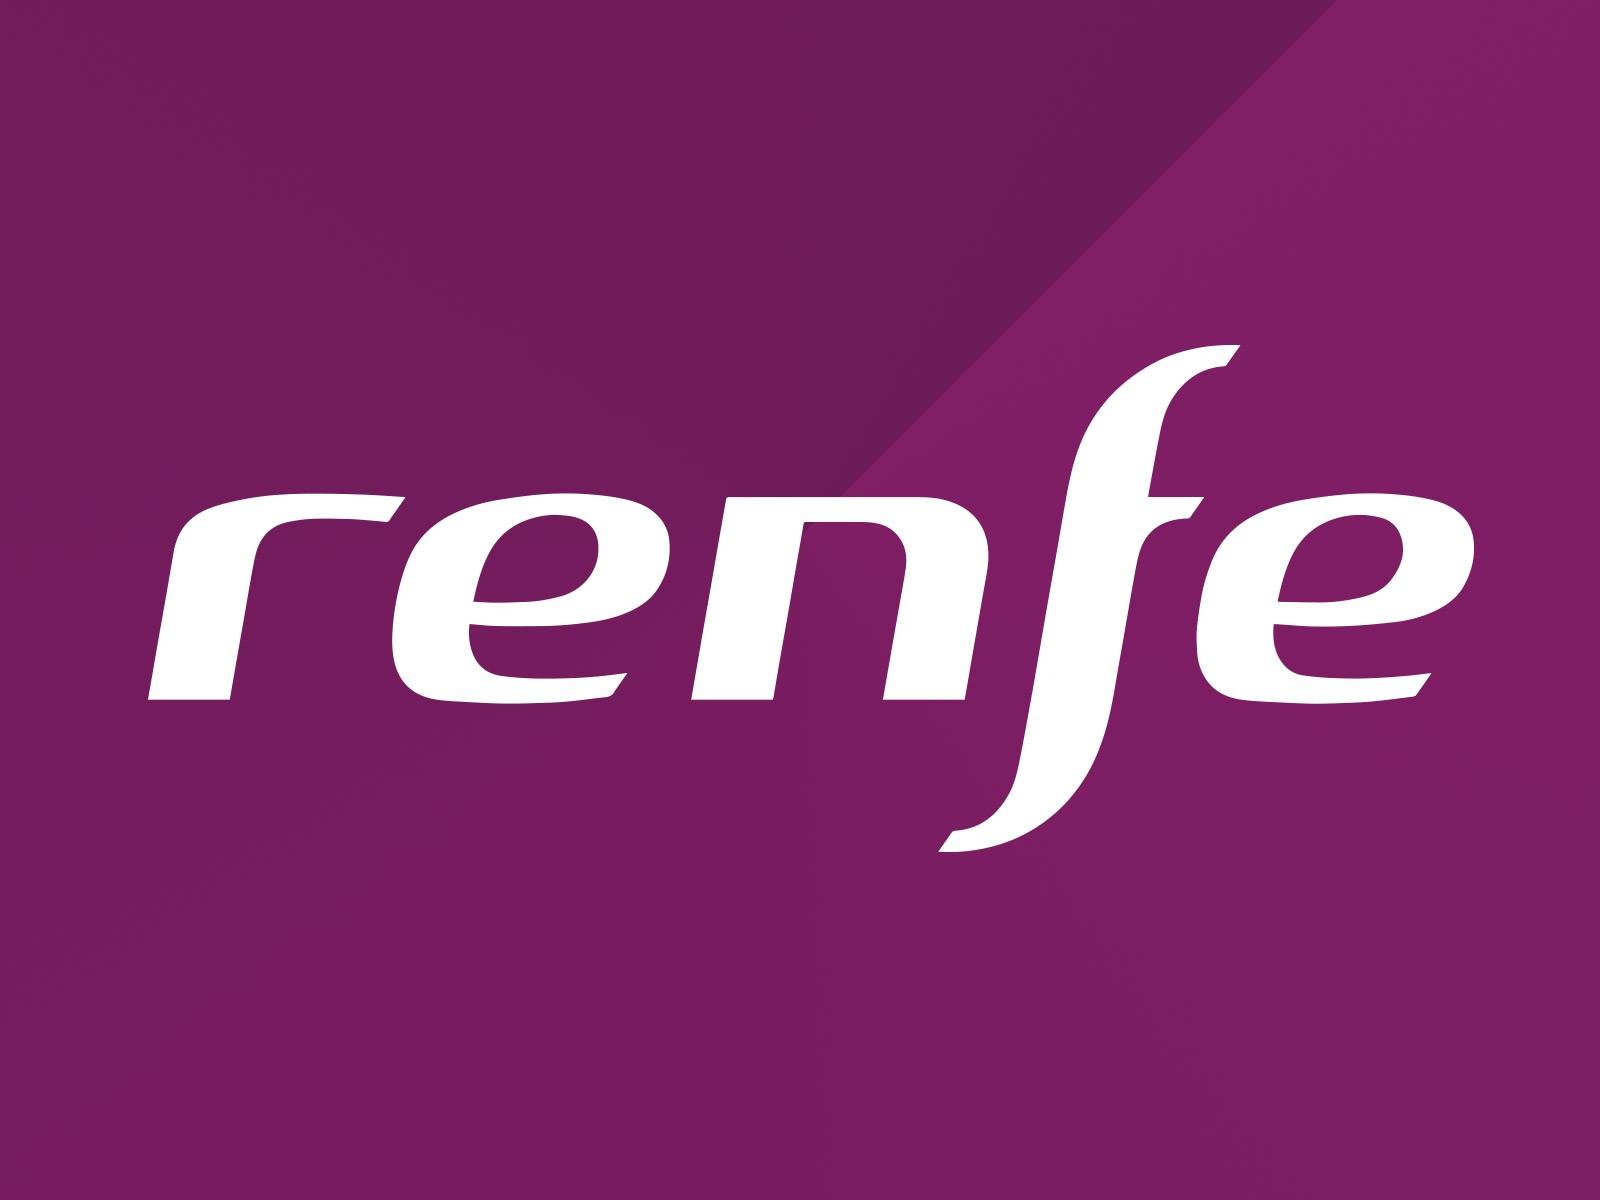 Renfe convoca 57 plazas de técnicos para ingresar o personal laboral fijo